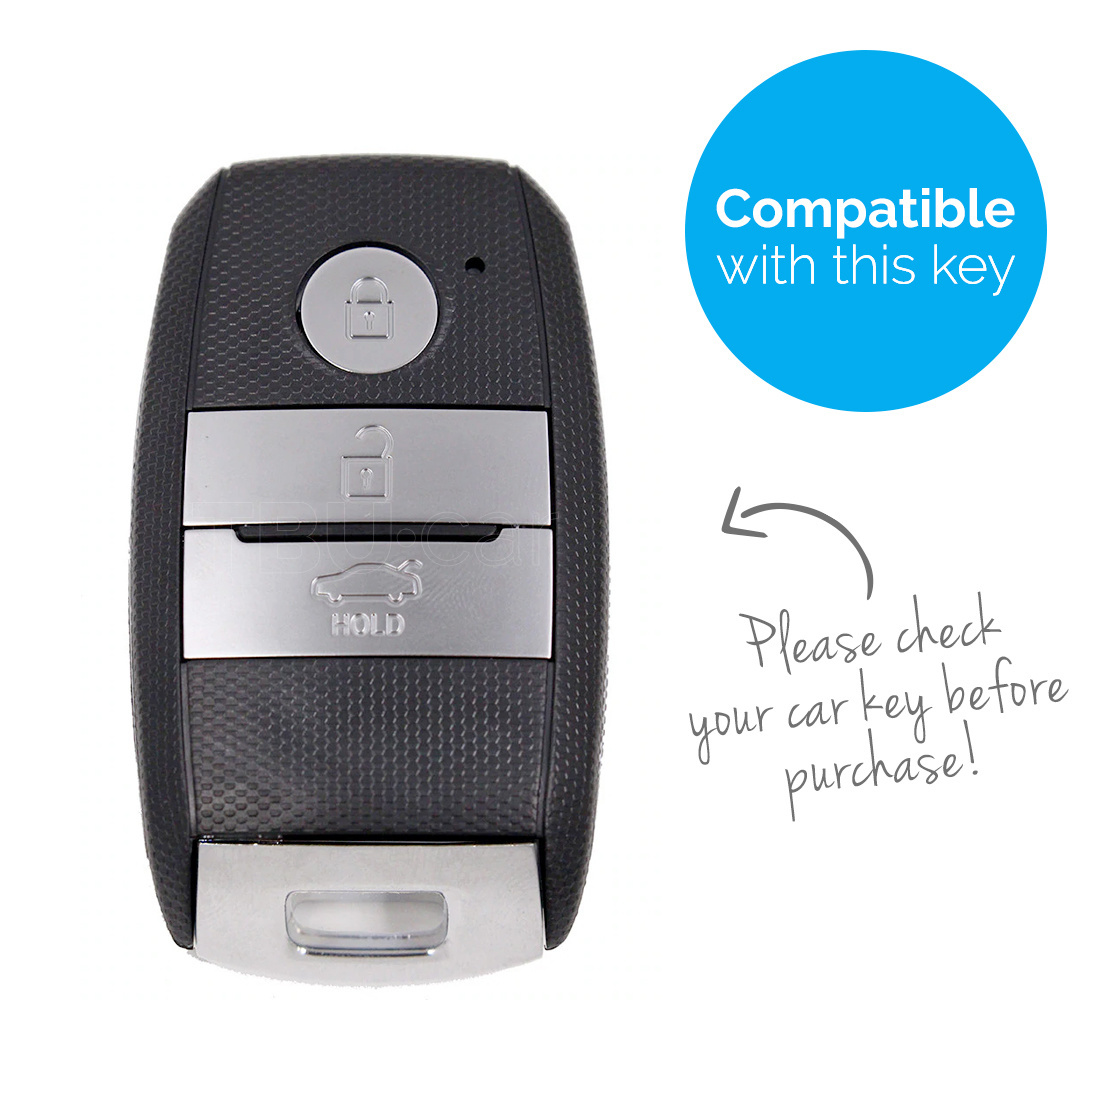 TBU car Autoschlüssel Hülle für Kia 3 Tasten (Keyless Entry) - Schutzhülle aus Silikon - Auto Schlüsselhülle Cover in Lindgrün